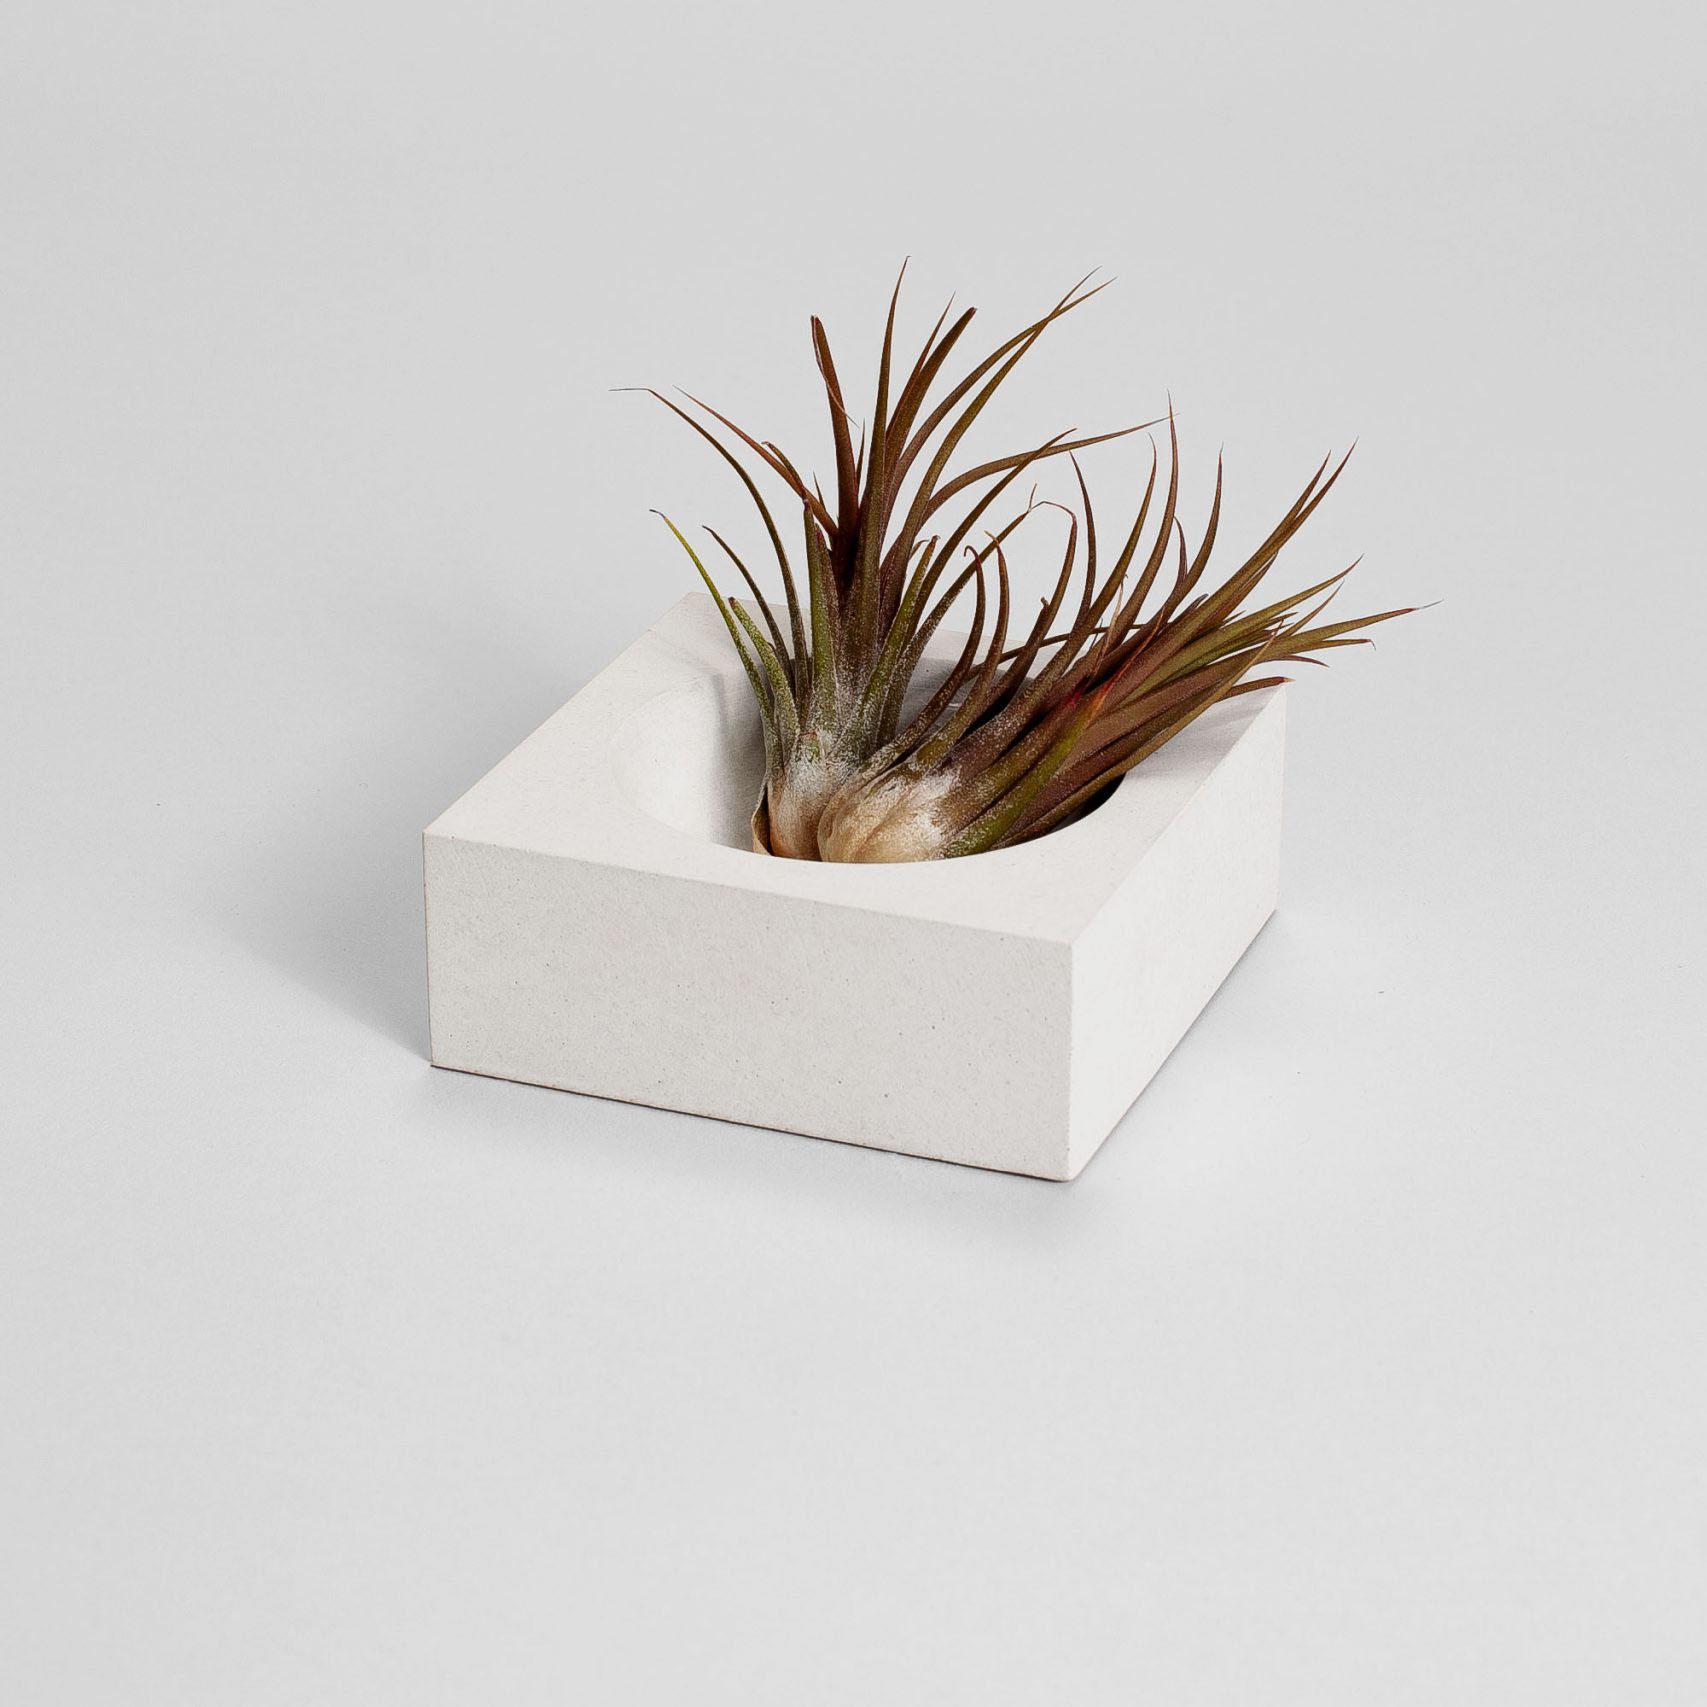 Zdjęcie produktu WHITE CONCRETE GEOMETRIC BOWL